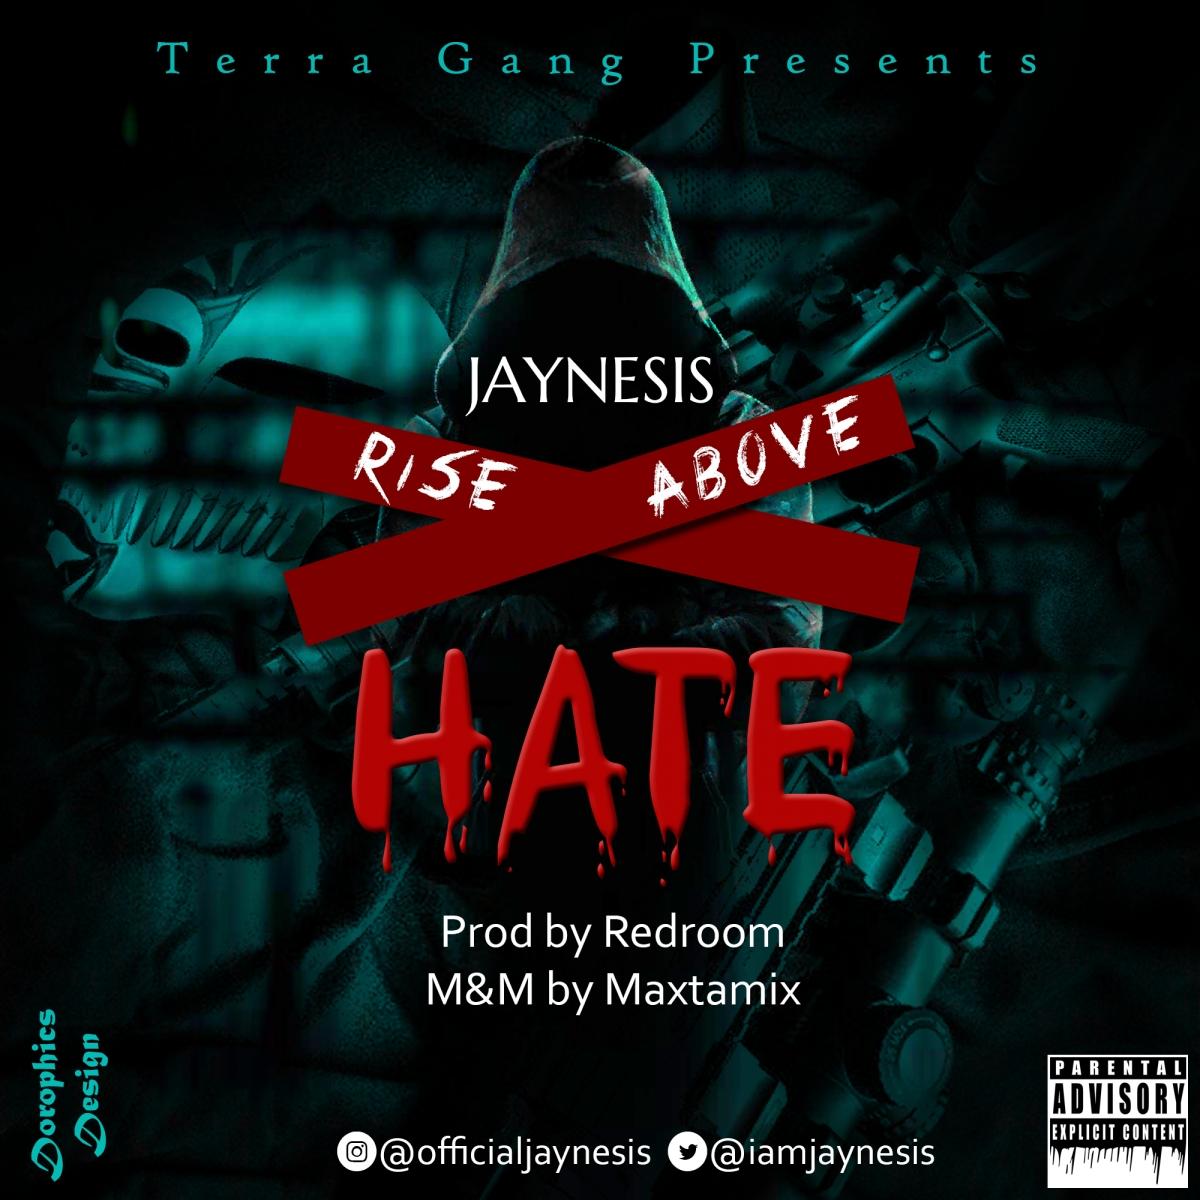 Jaynesis - Rise Above Hate